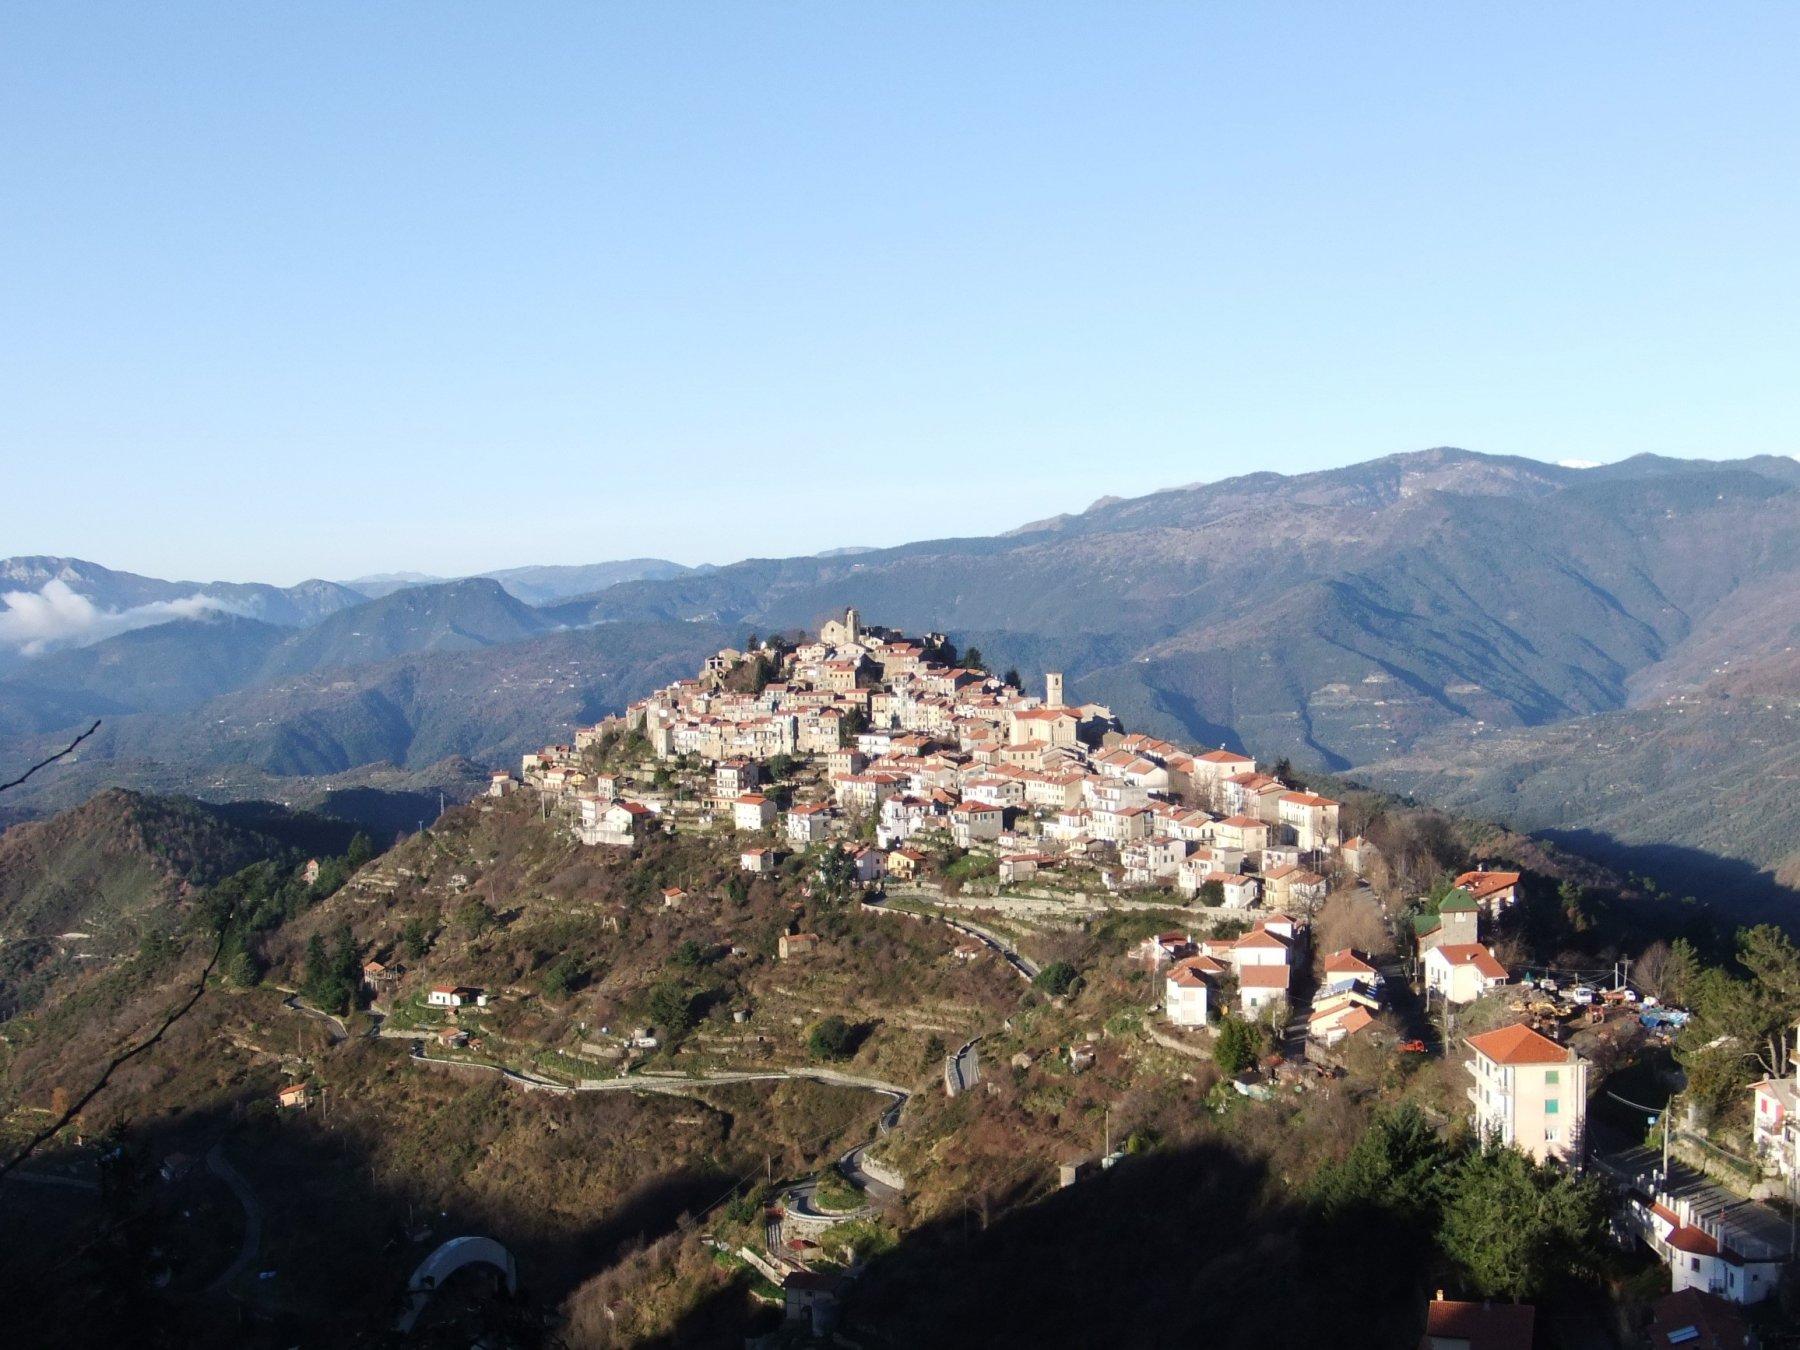 Ceppo (Monte) da Baiardo 2019-12-28